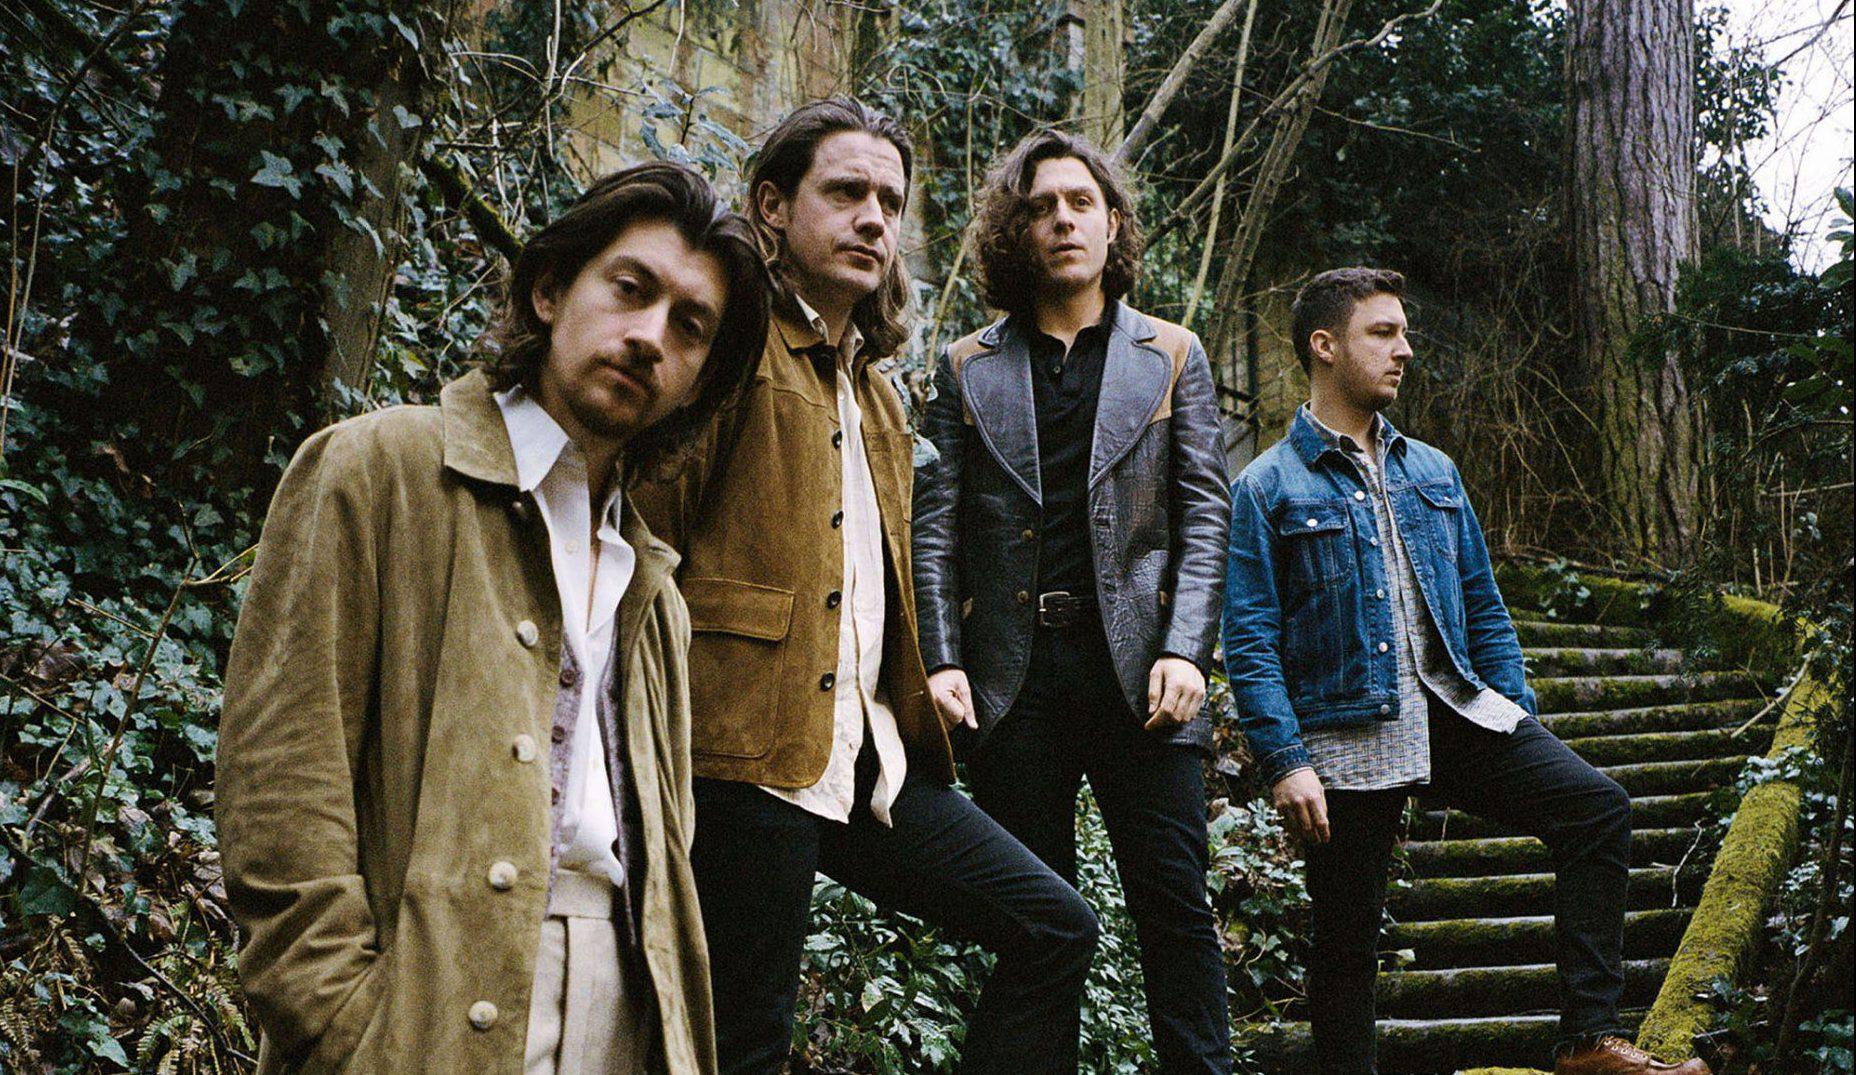 Arctic Monkeys' Alex Turner won't go solo